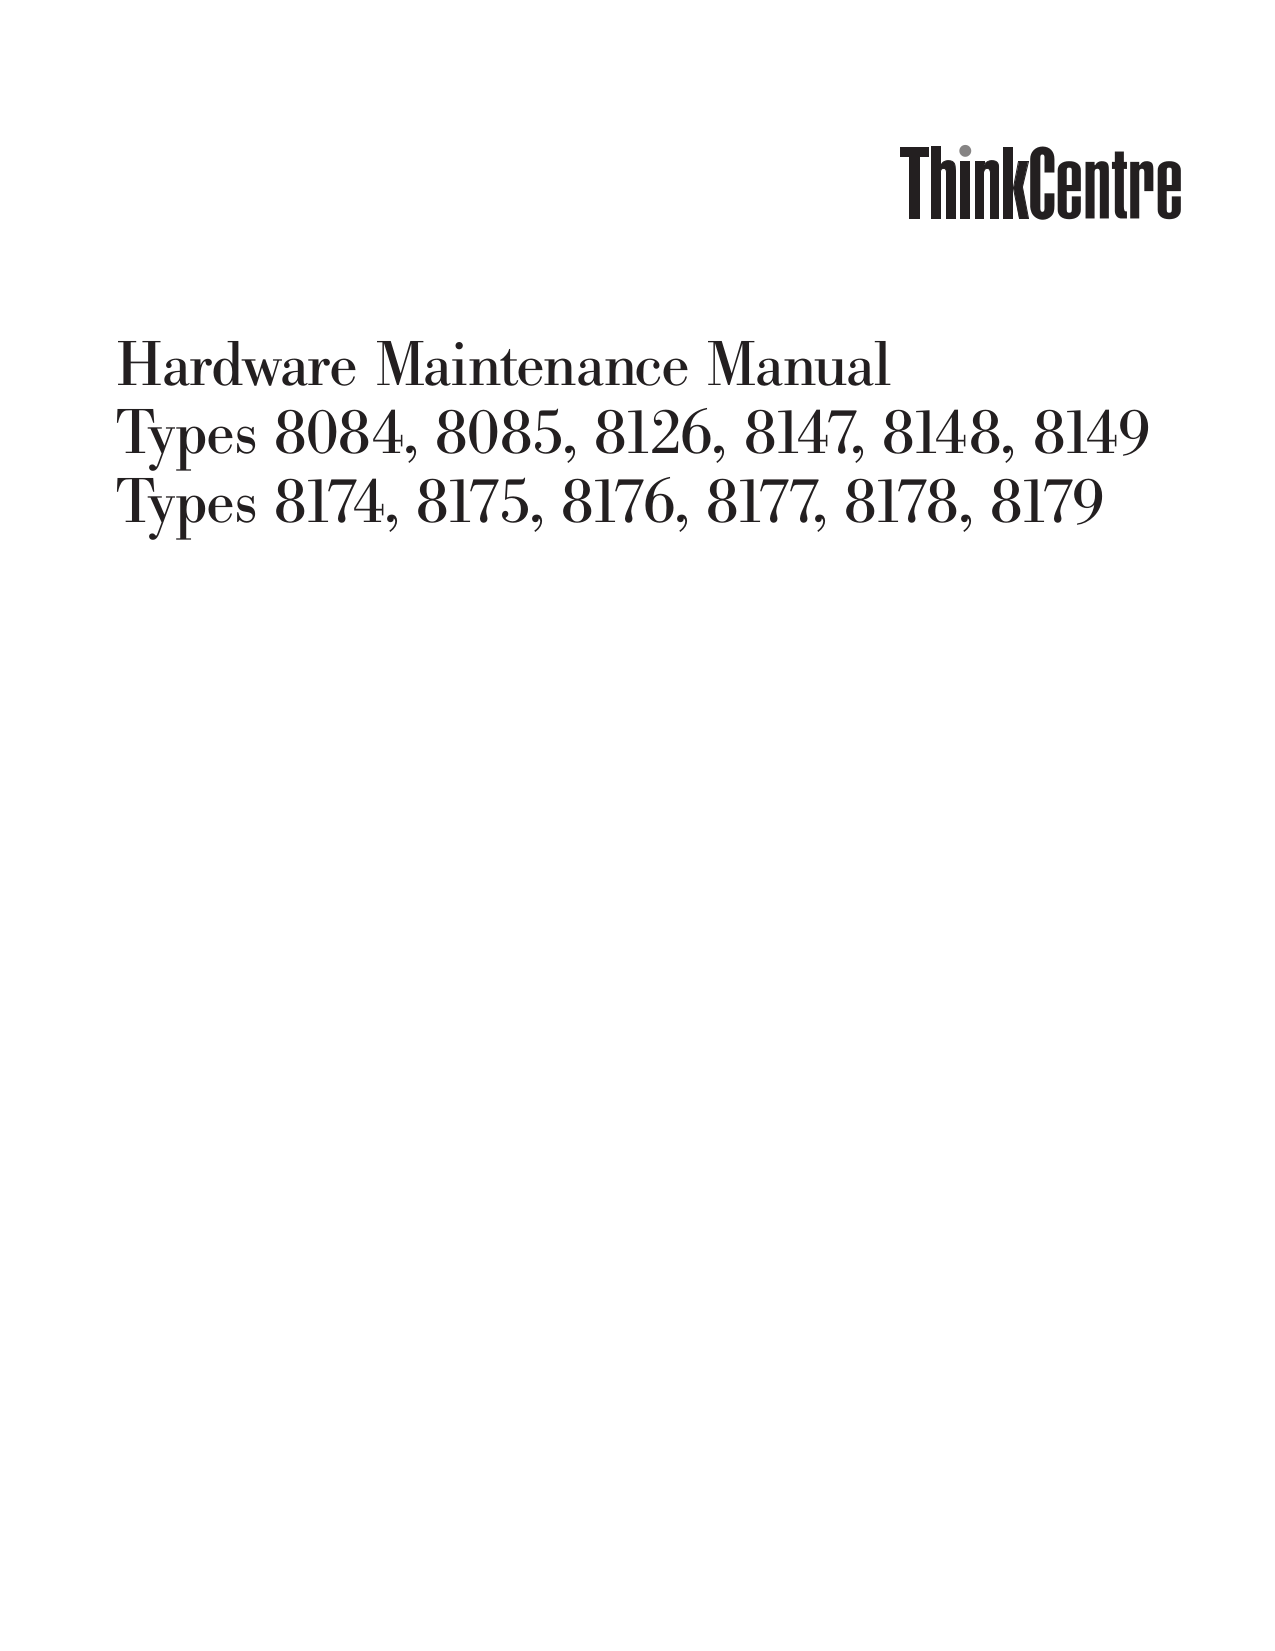 pdf for Lenovo Desktop ThinkCentre A50 8148 manual